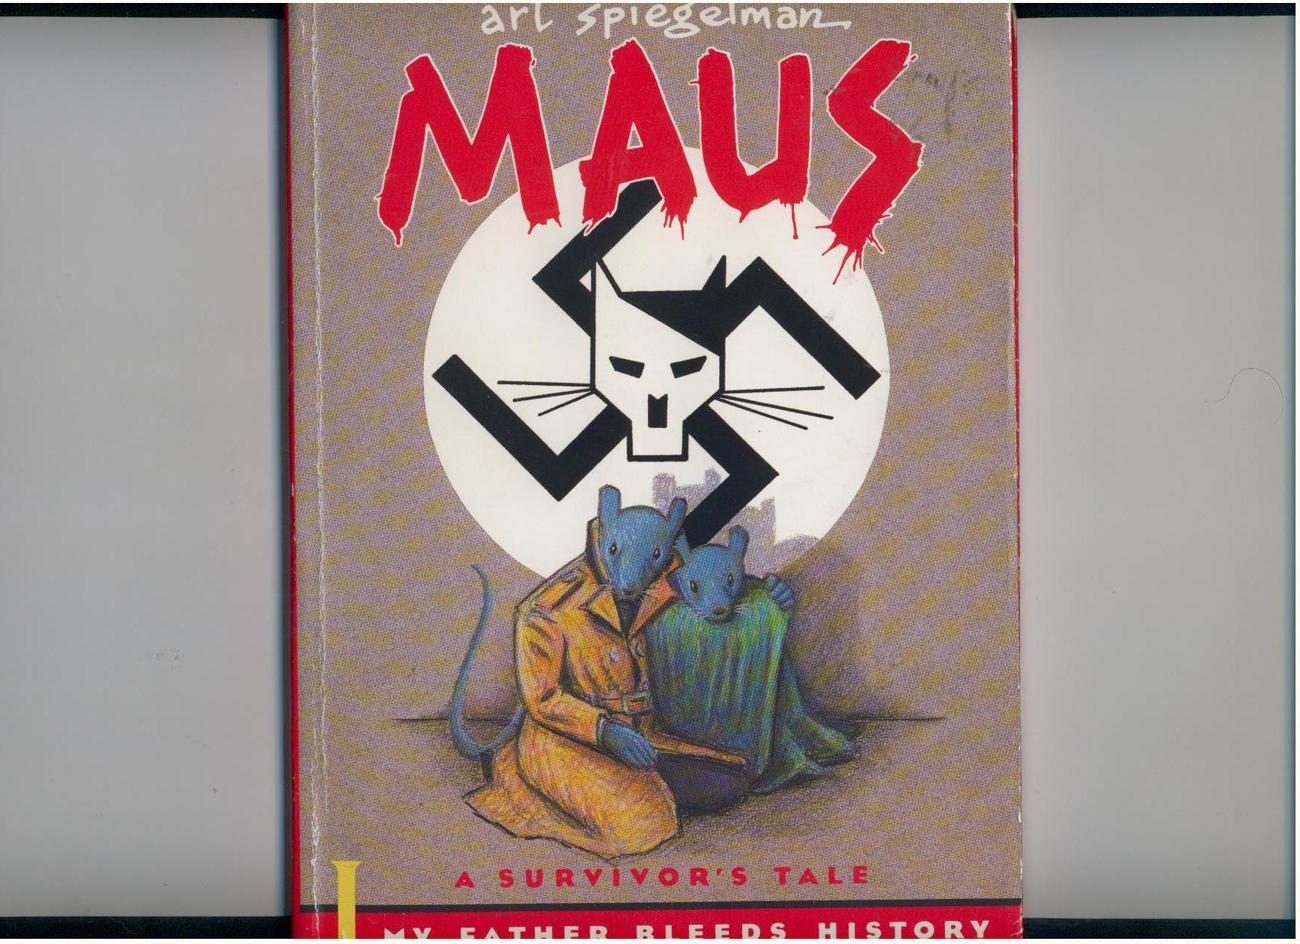 Spiegelman - MAUS: SURVIVOR'S TALE - graphic novel - part 1